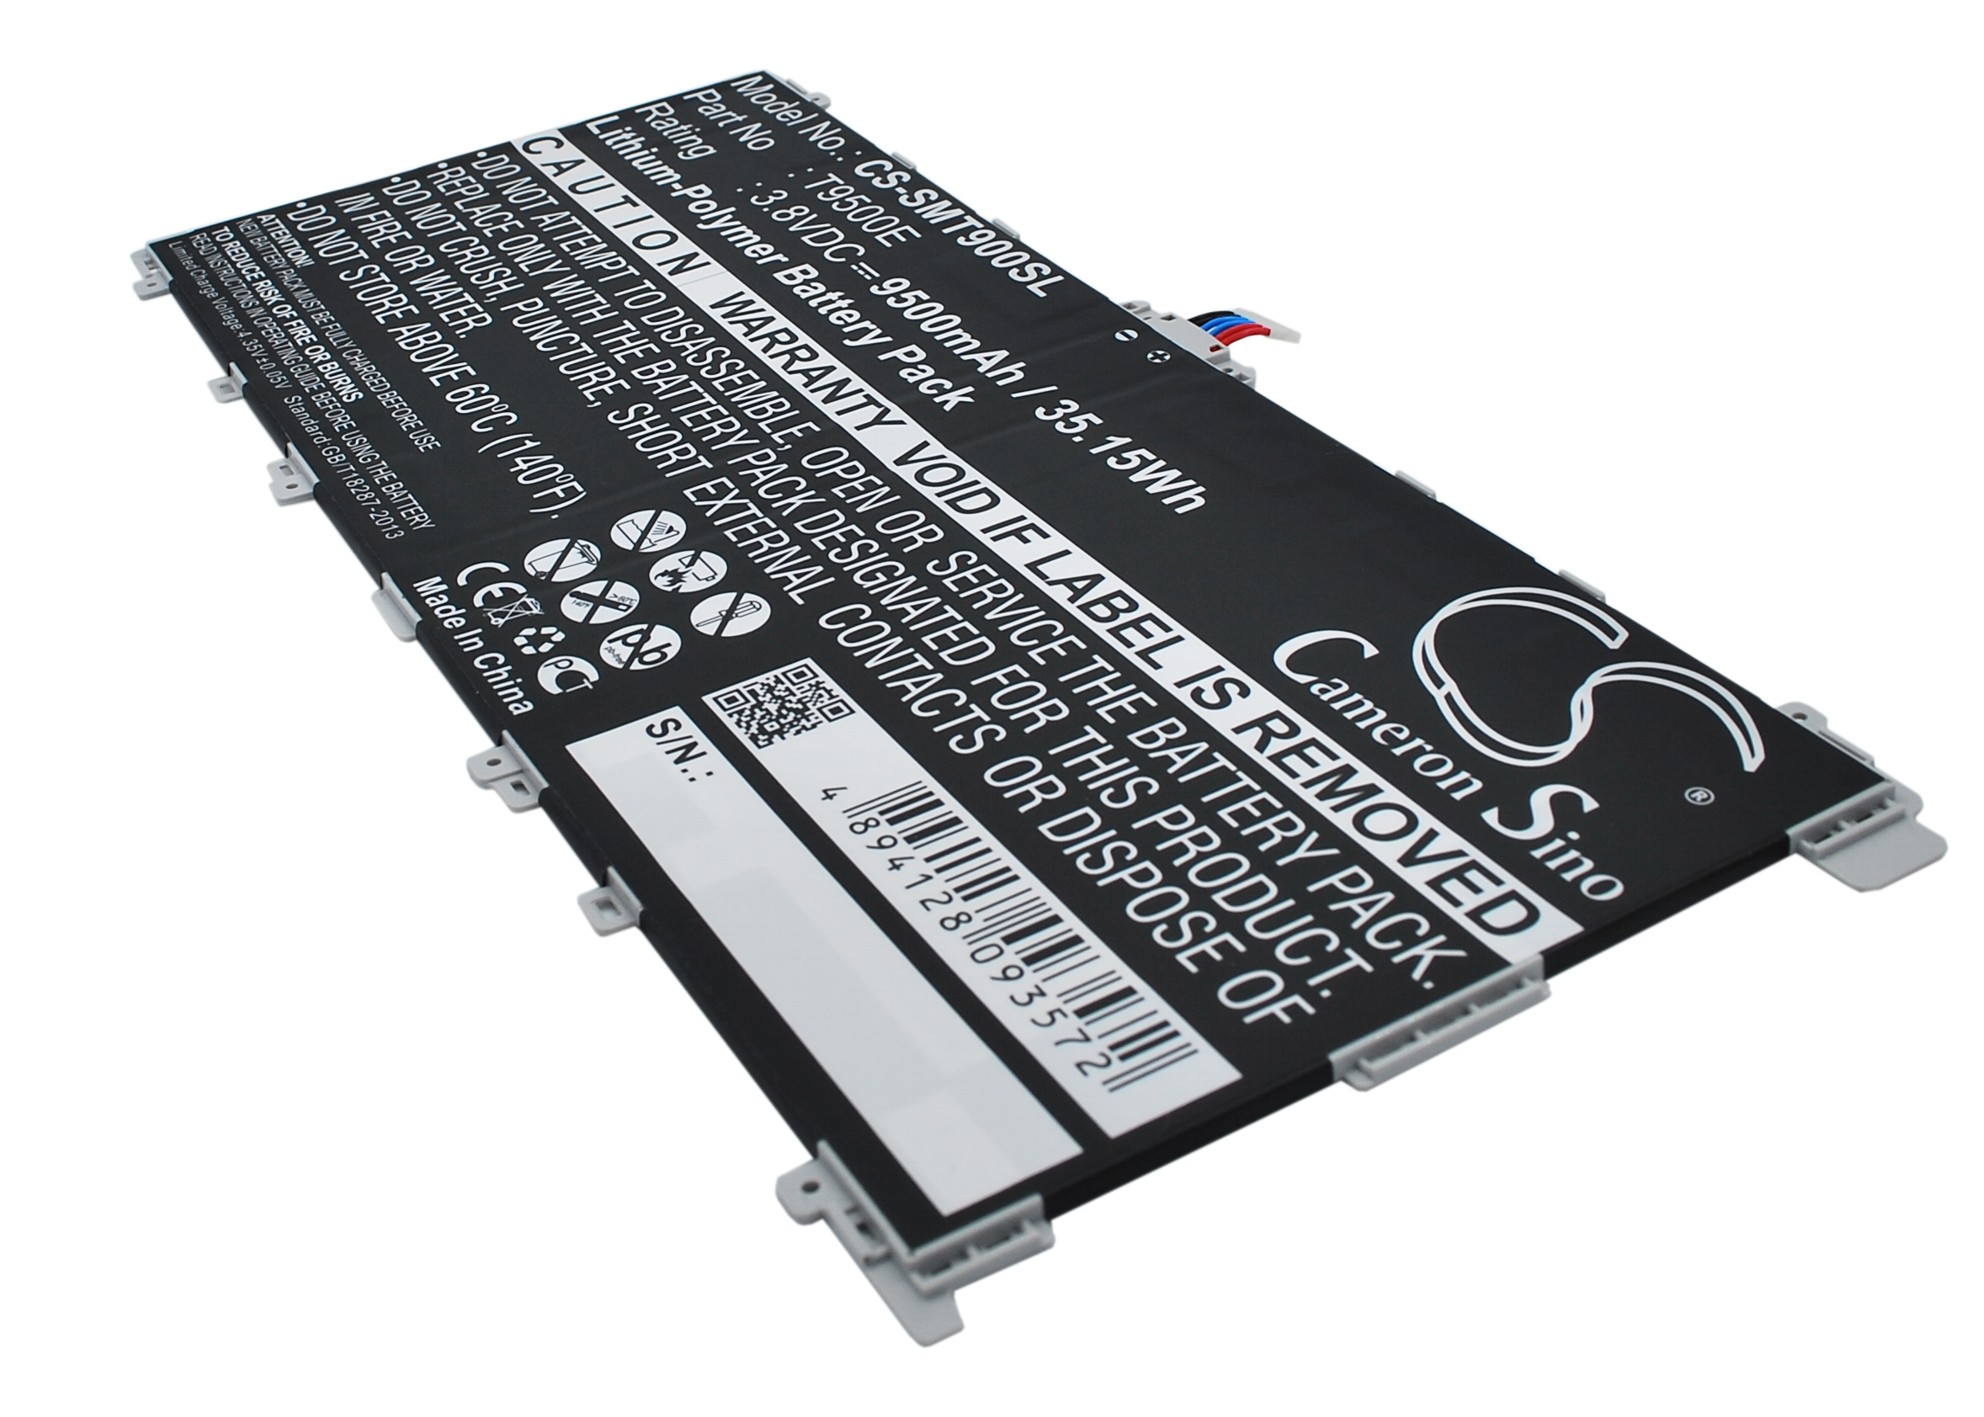 Cameron Sino baterie do tabletů pro SAMSUNG SM-T900 3.8V Li-Polymer 9500mAh černá - neoriginální